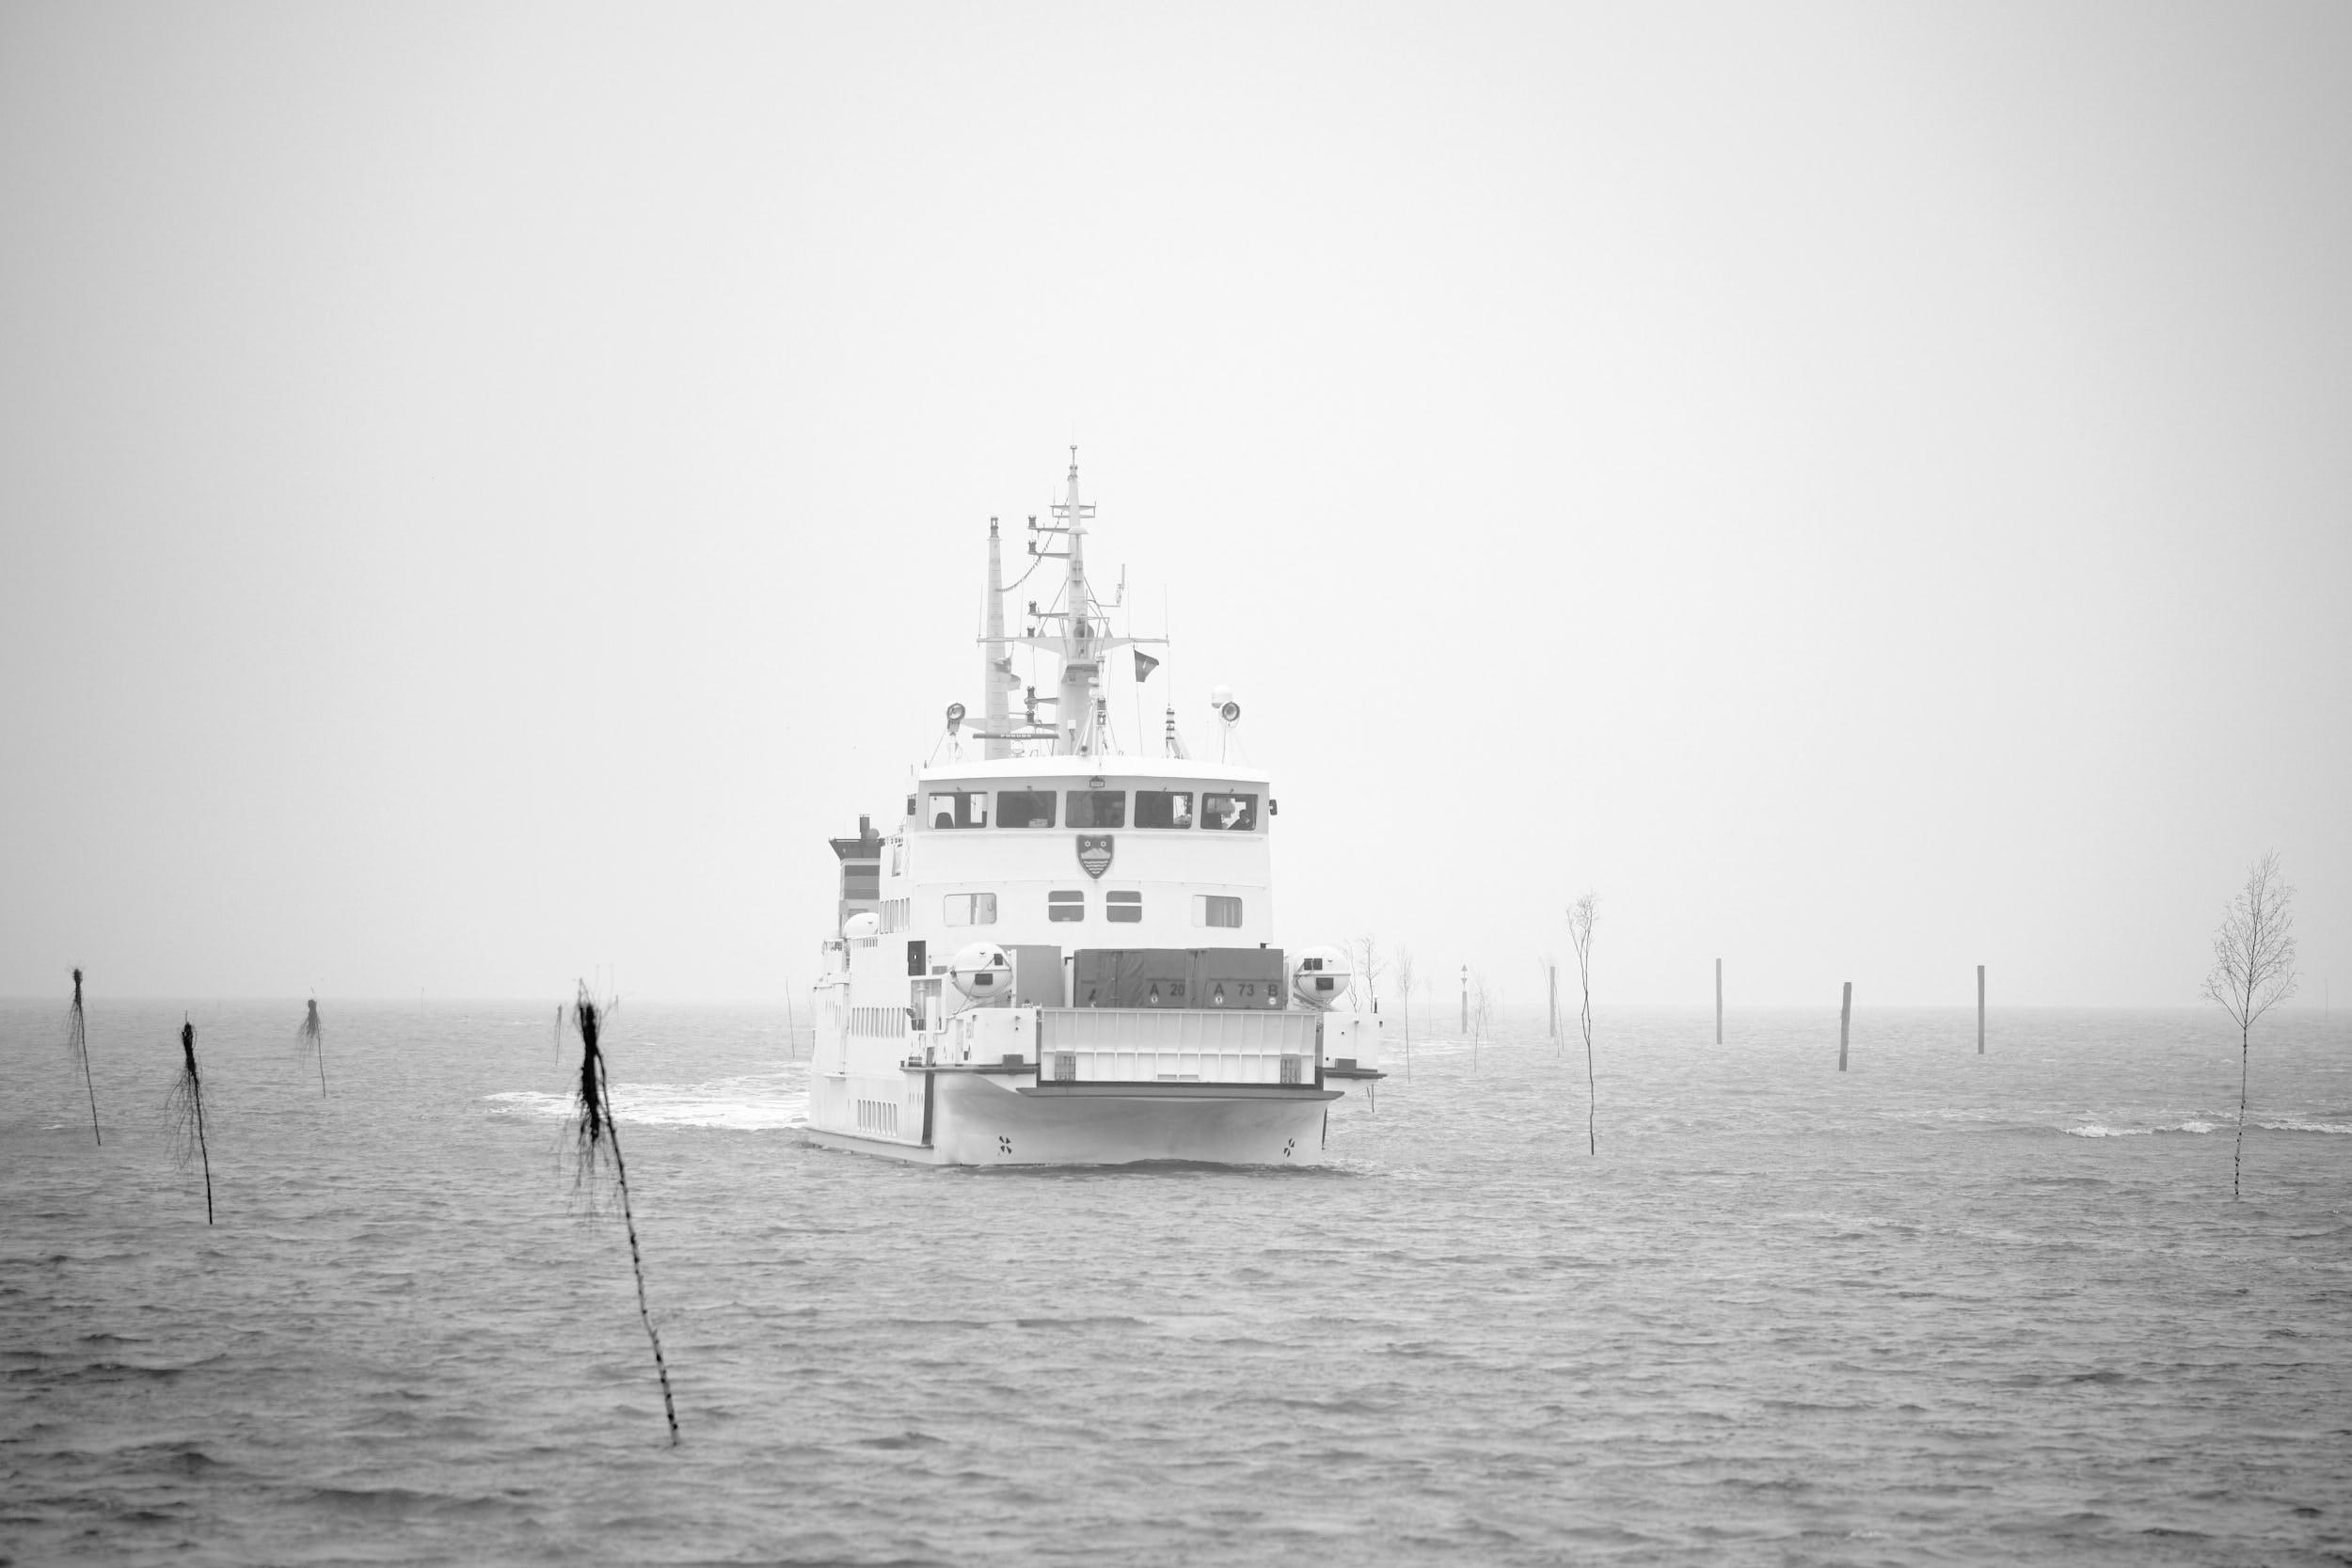 Fähre Juist Norddeich Mole Nebel